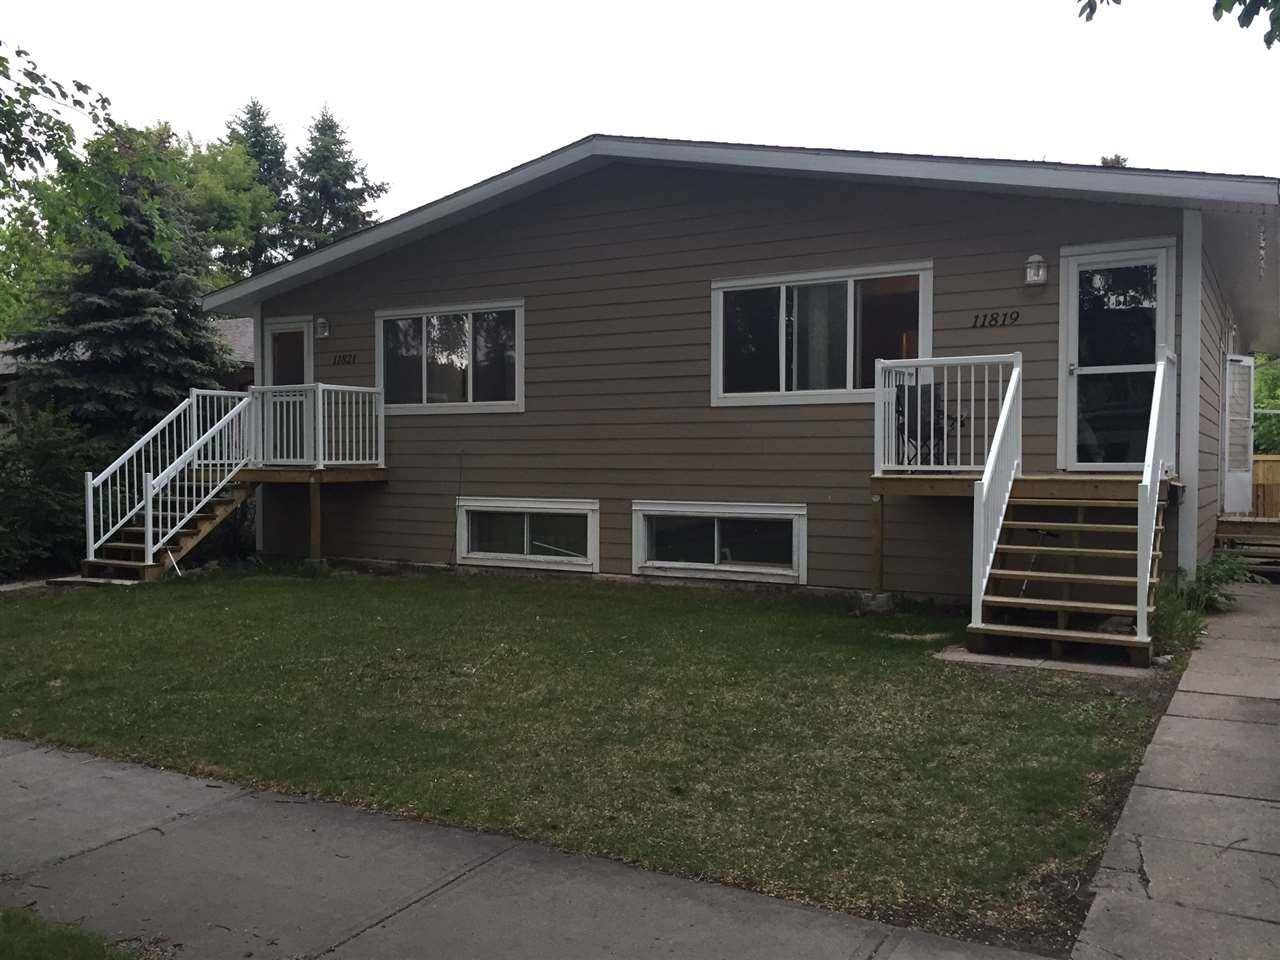 Townhouse for sale at 11821 40 St Nw Unit 11819 Edmonton Alberta - MLS: E4195393